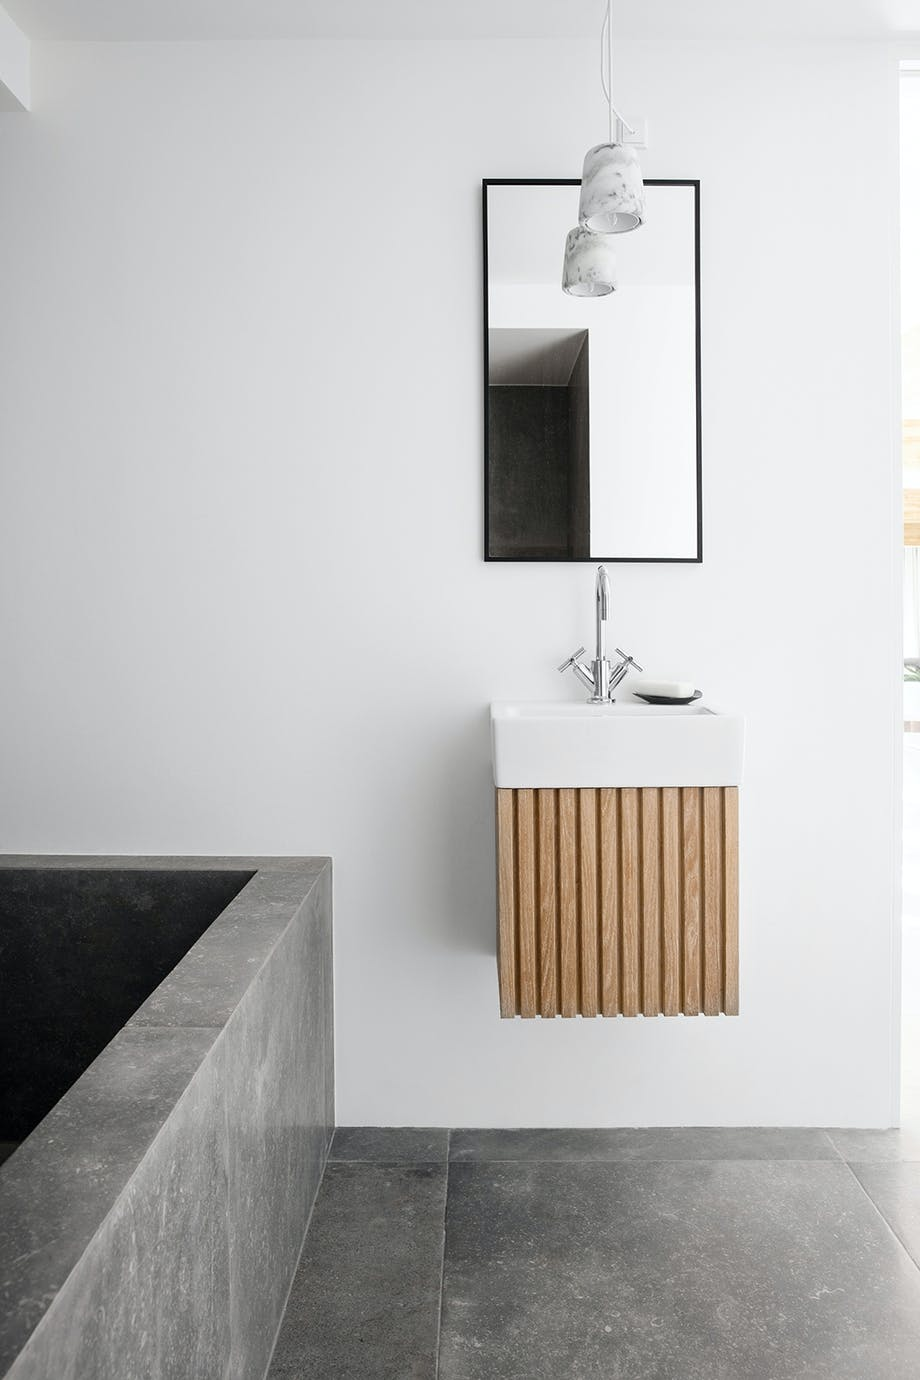 Badeværelse Armatur fra Dornbracht marmorlampe